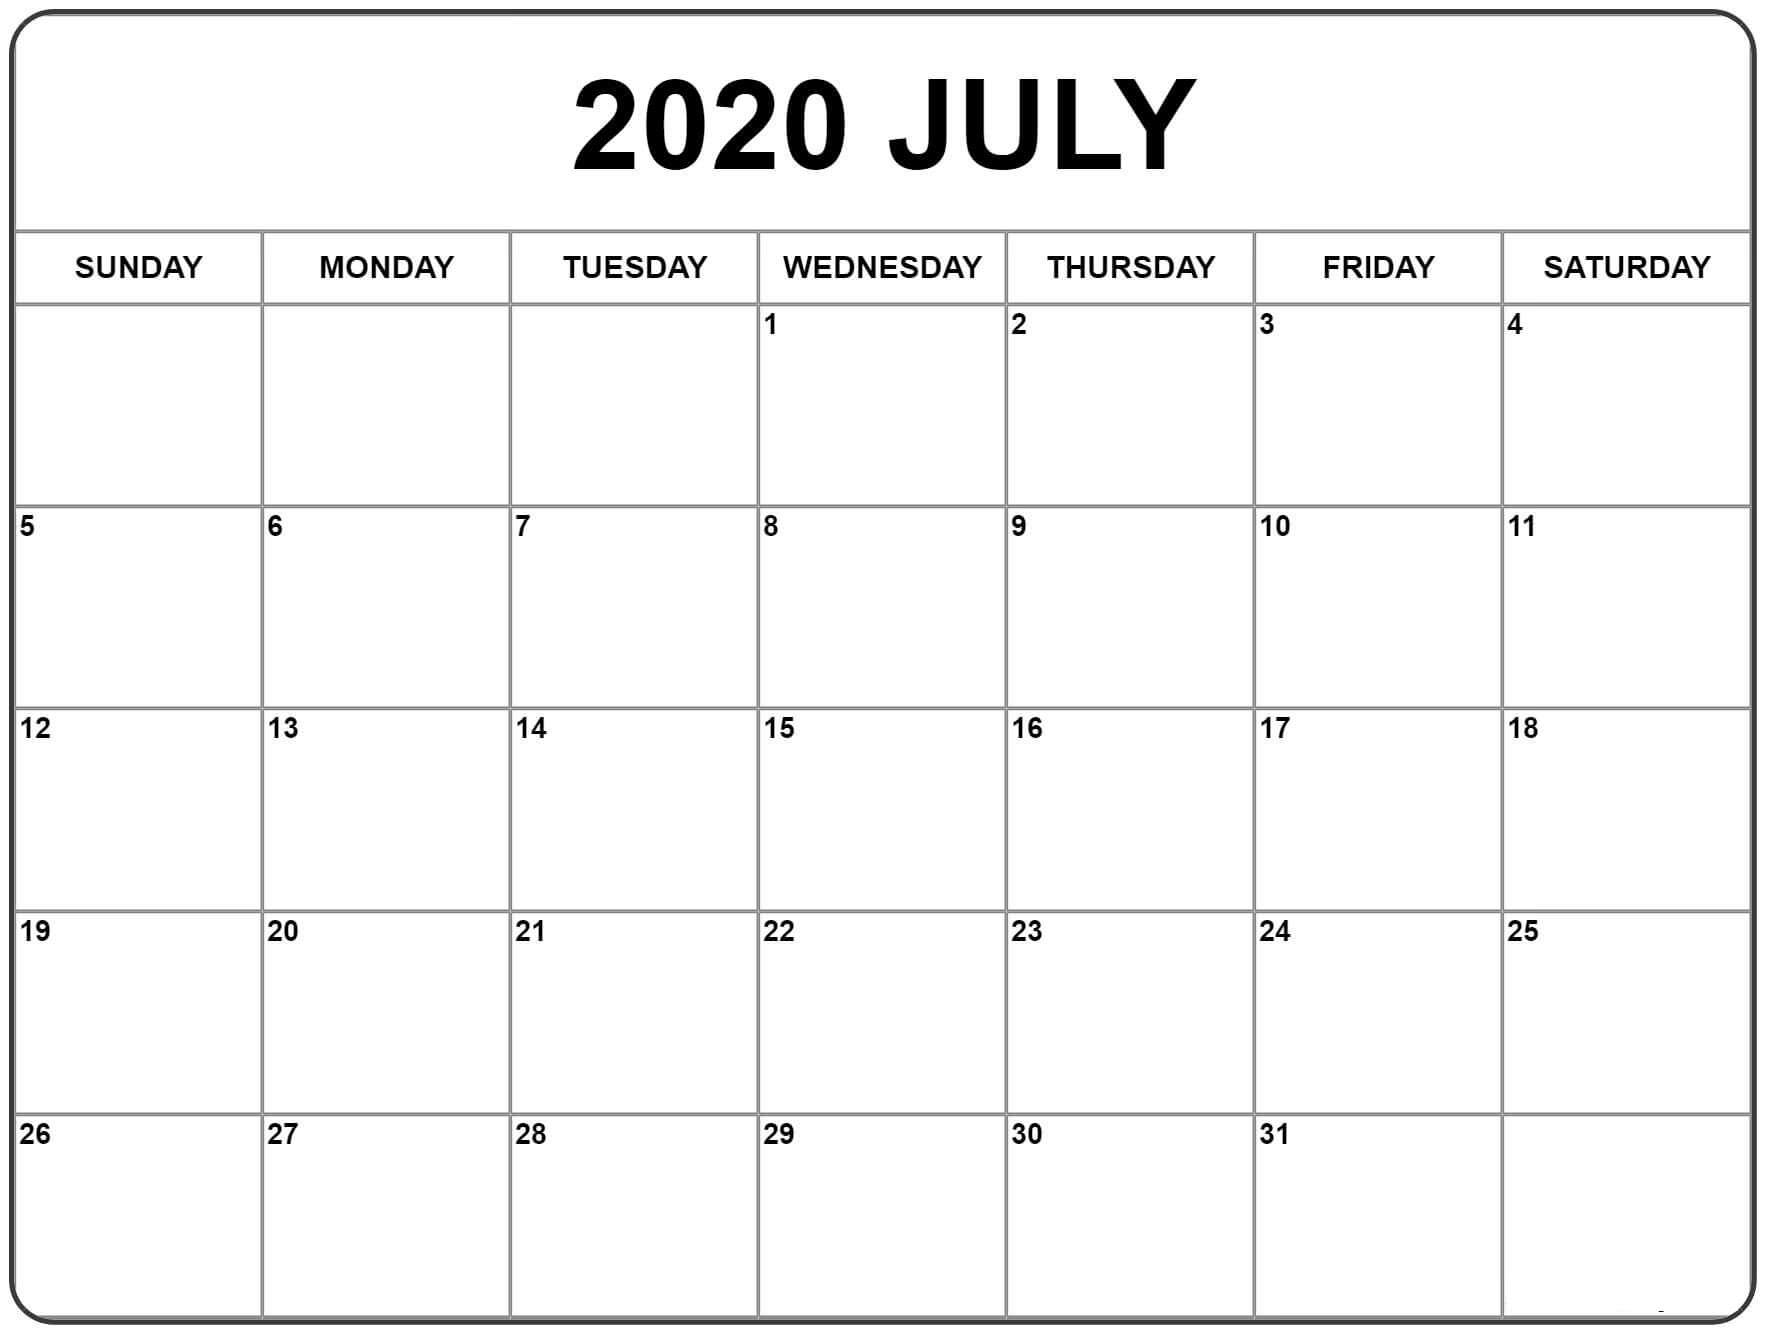 July 2020 Calendar With Holidays Sheet